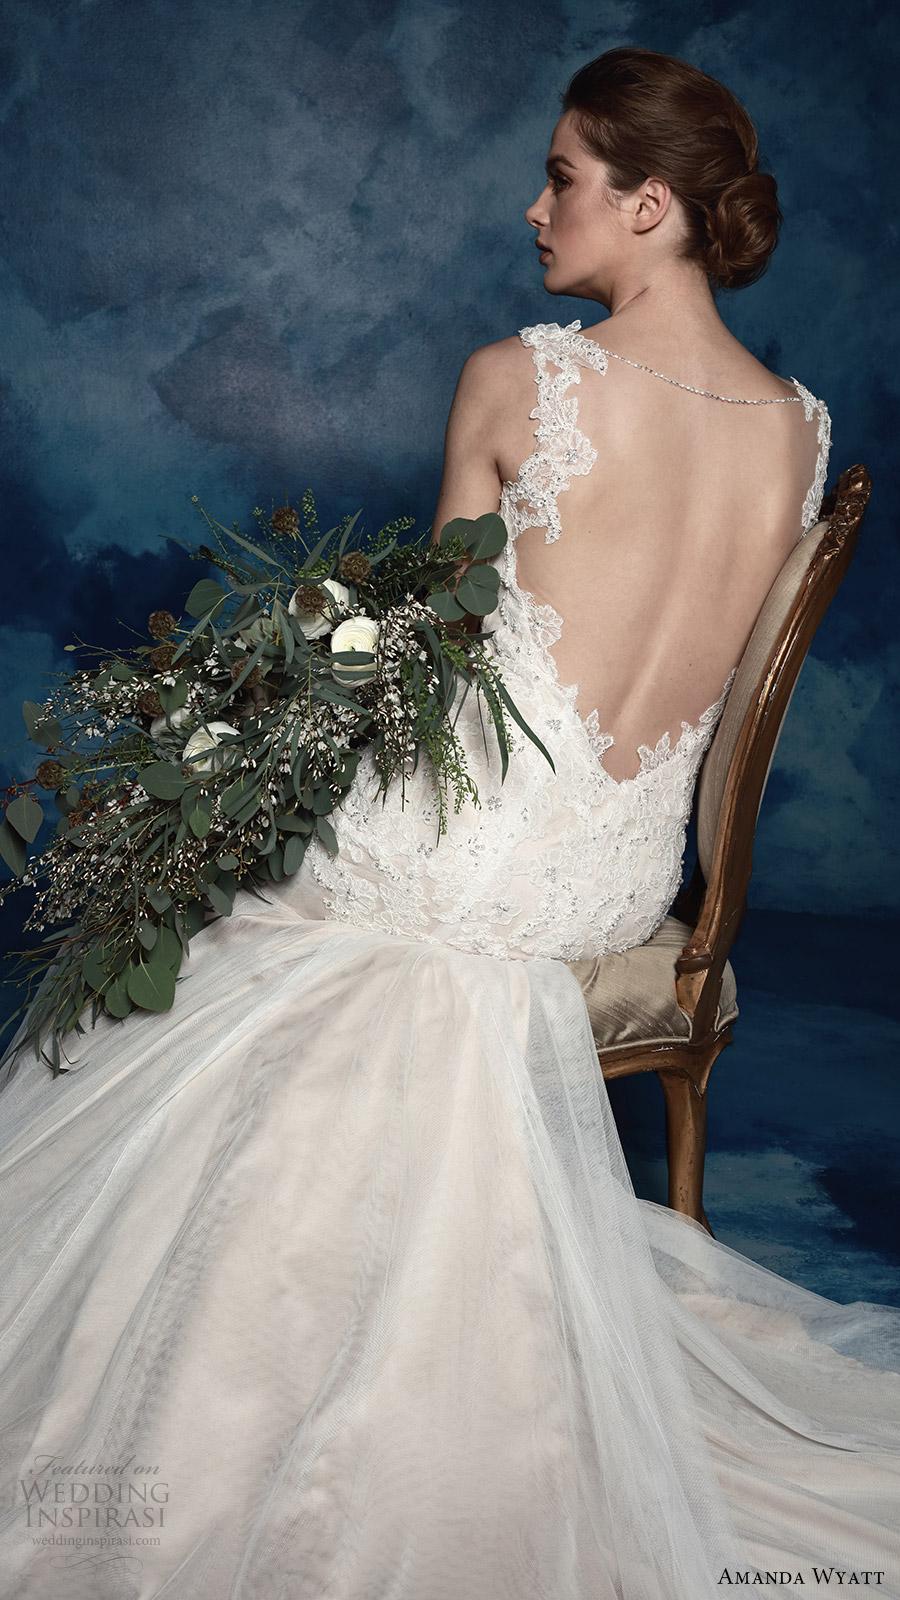 amanda wyatt bridal 2017 sleeveless sweetheart illusion jewel trumpet wedding dress (paola) bv low back